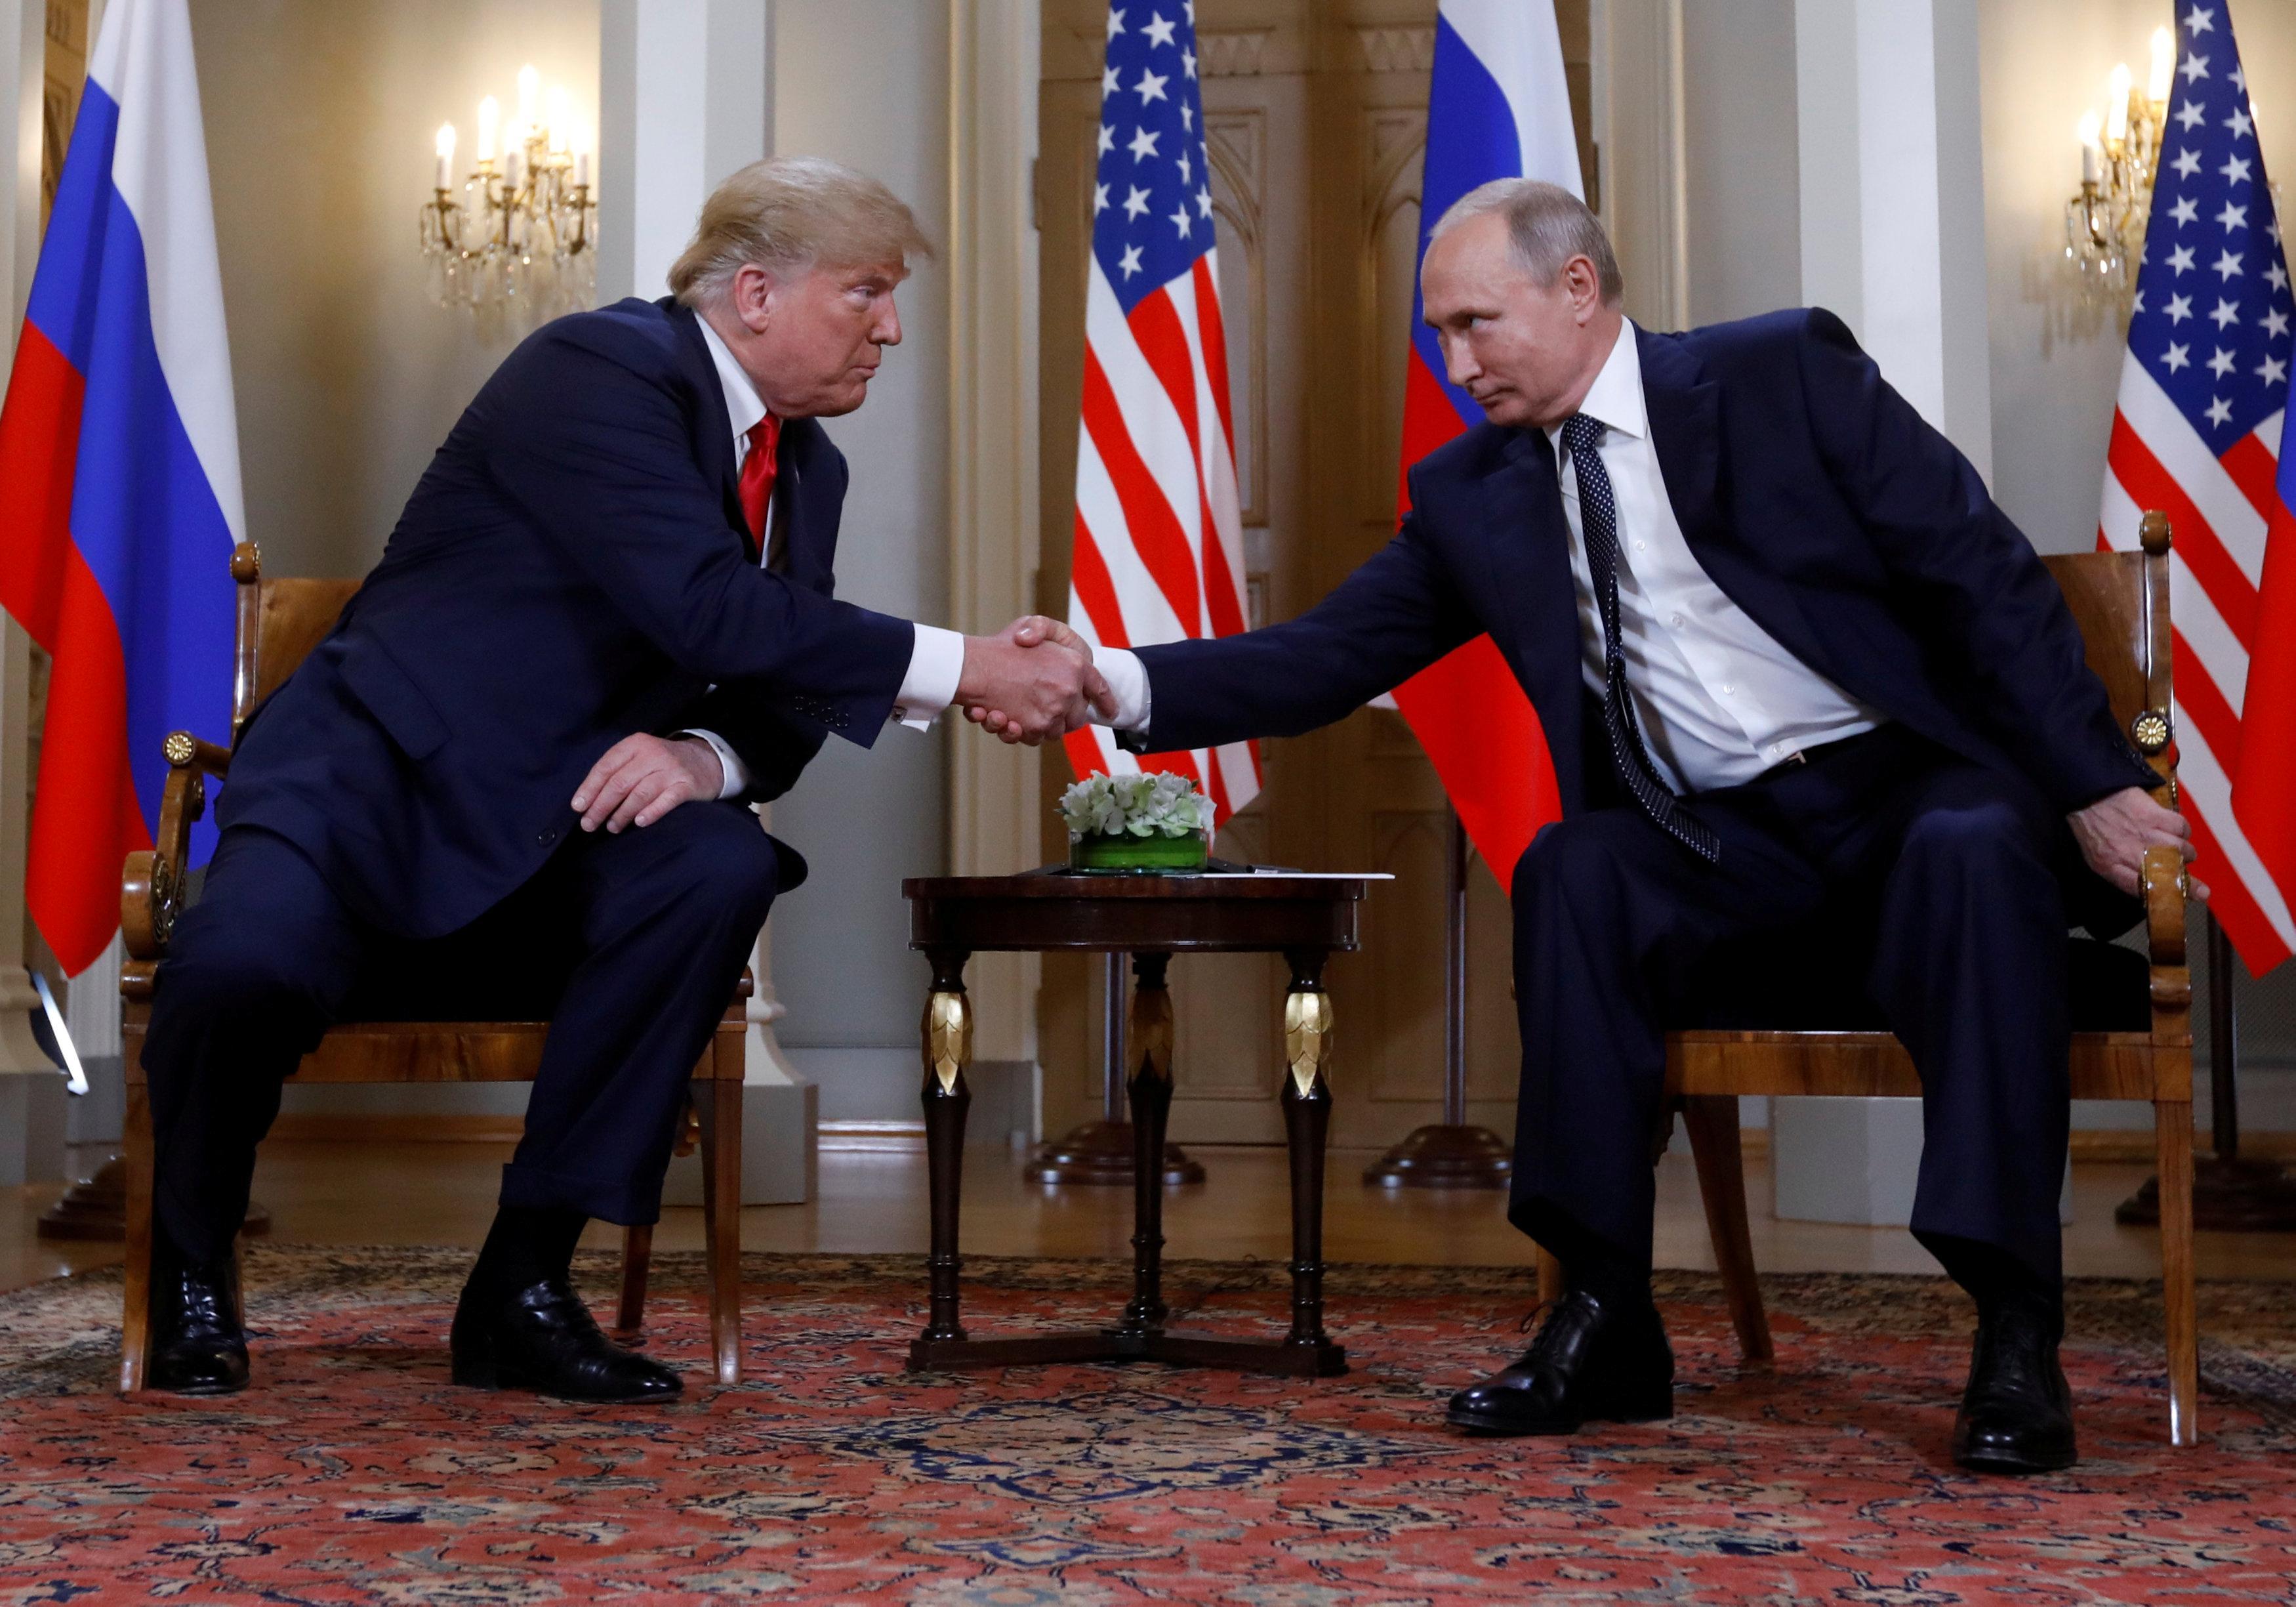 Hasil gambar untuk Trump says it 'certainly looks' as if Khashoggi is dead / wapo / GIF